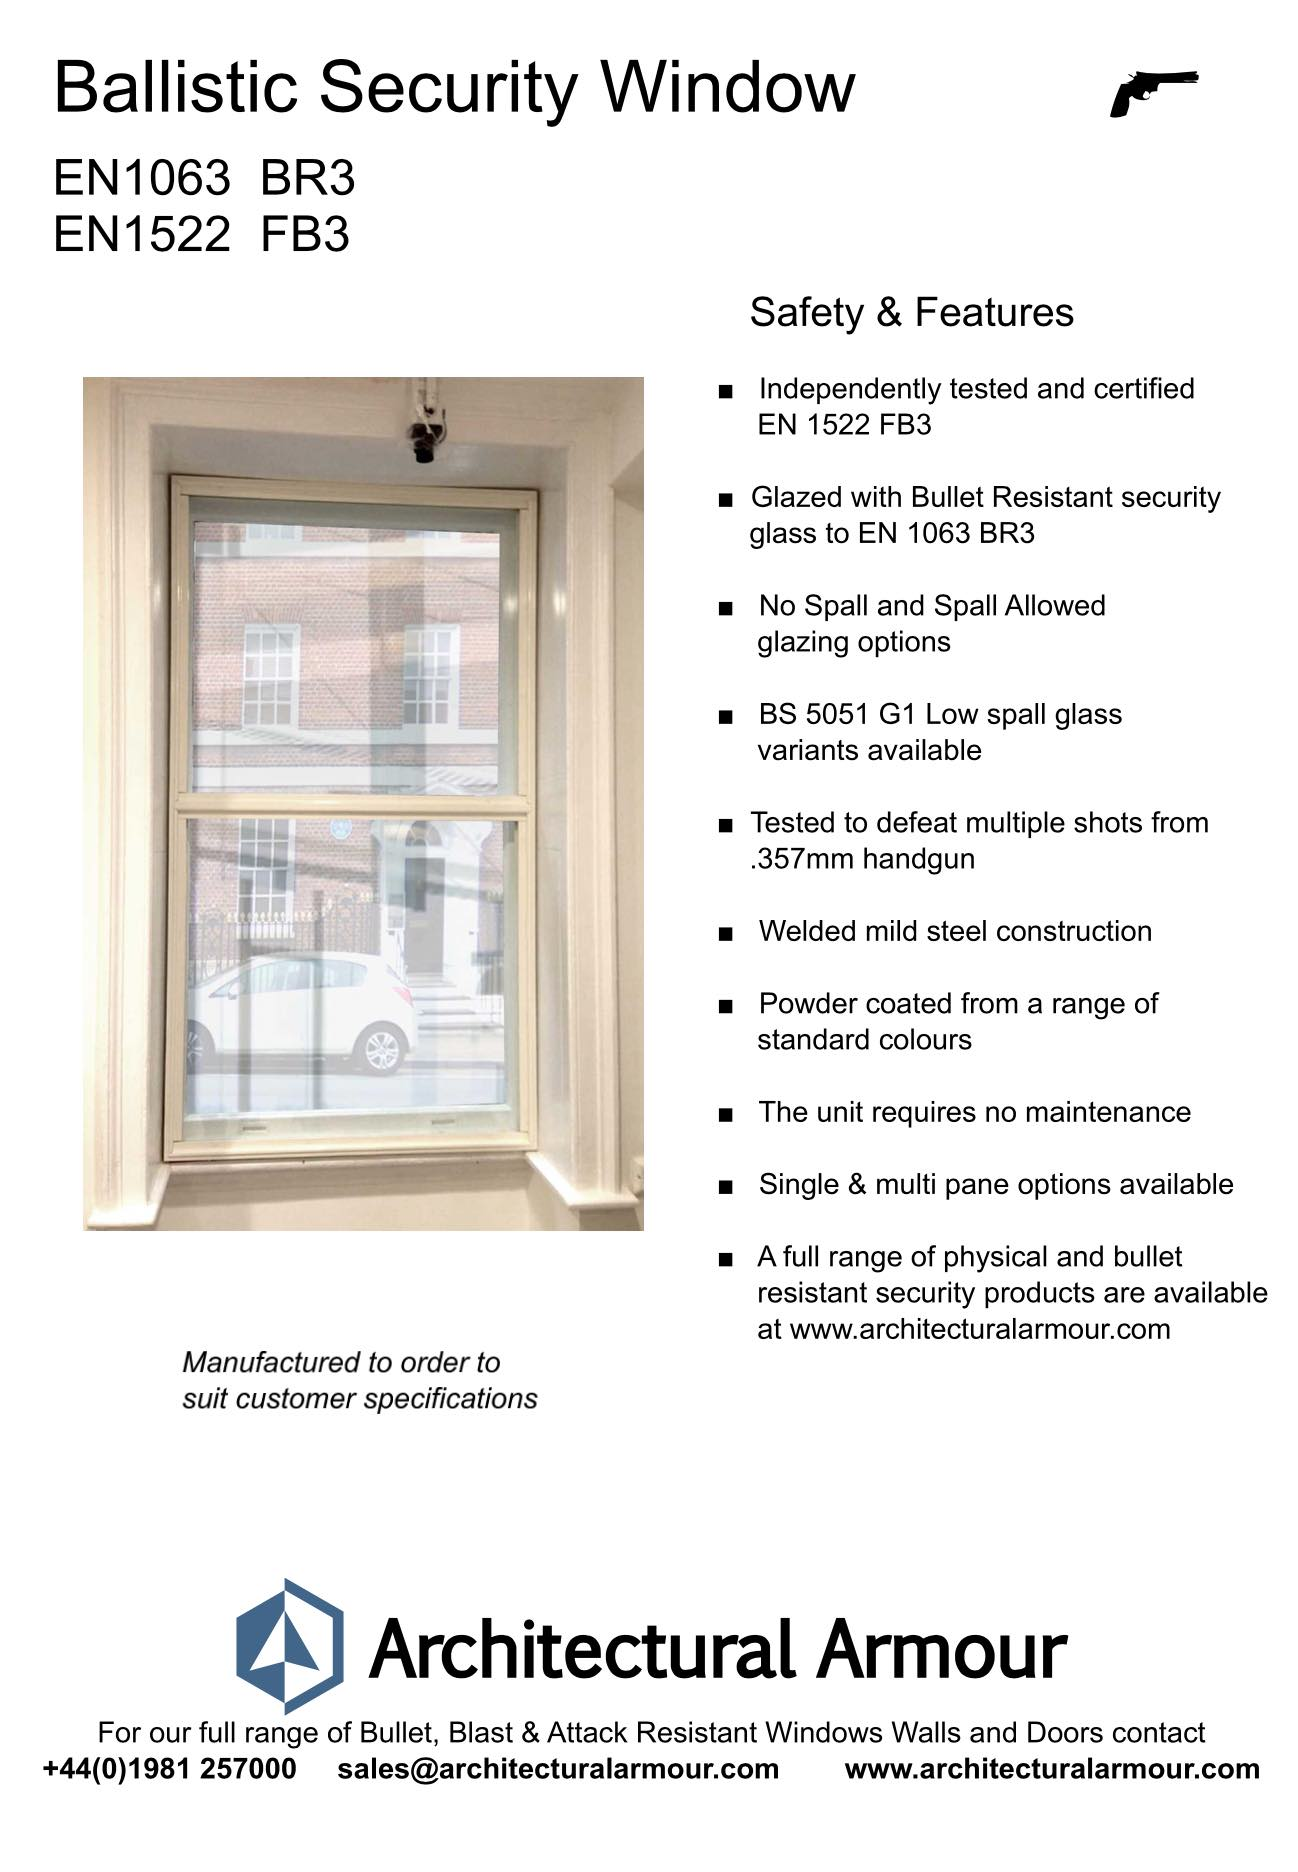 EN 1063 BR3 EN 1522 FB3 Bullet Resistant Window Image